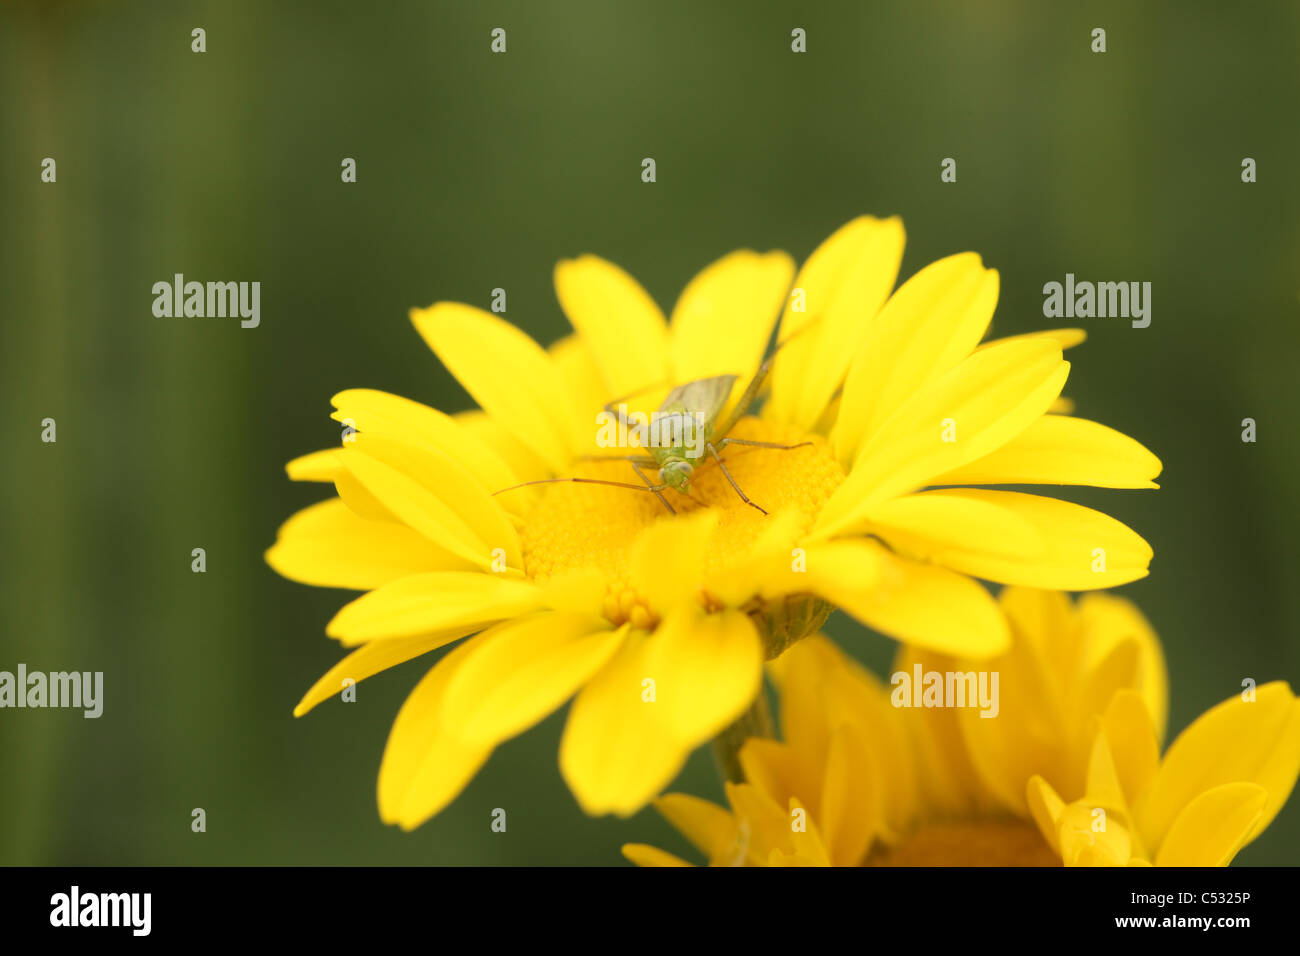 Common Green Capsid Bug (Lygocoris pabulinus) on a yellow daisy flower (Euryops pectinatus) in an English garden - Stock Image